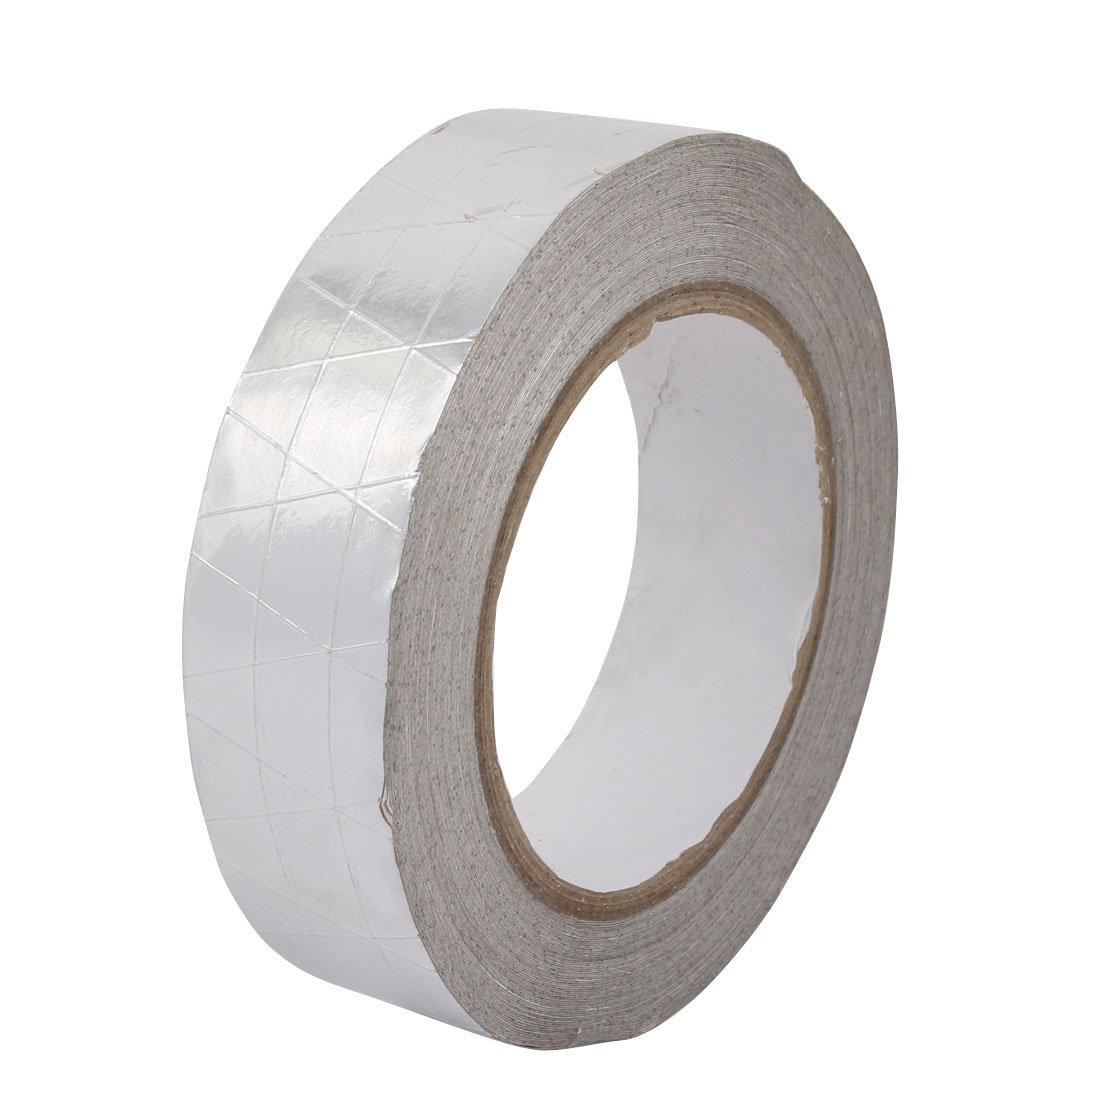 uxcell Aluminum Foil-Scrim-Kraft Insulation Jacketing Tape 20 Meter Length x 30mm Width